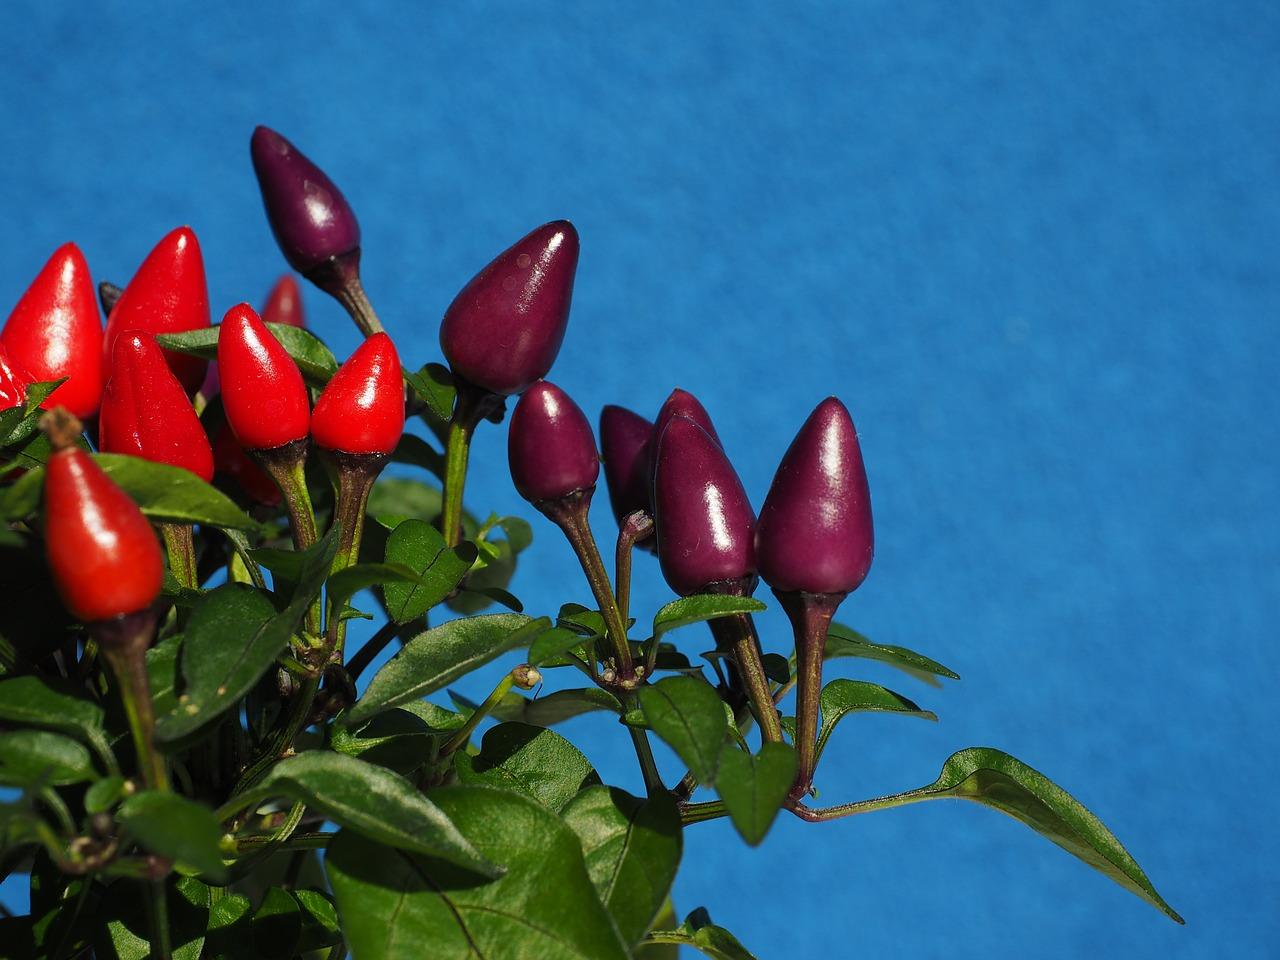 Ornamental pepper plants